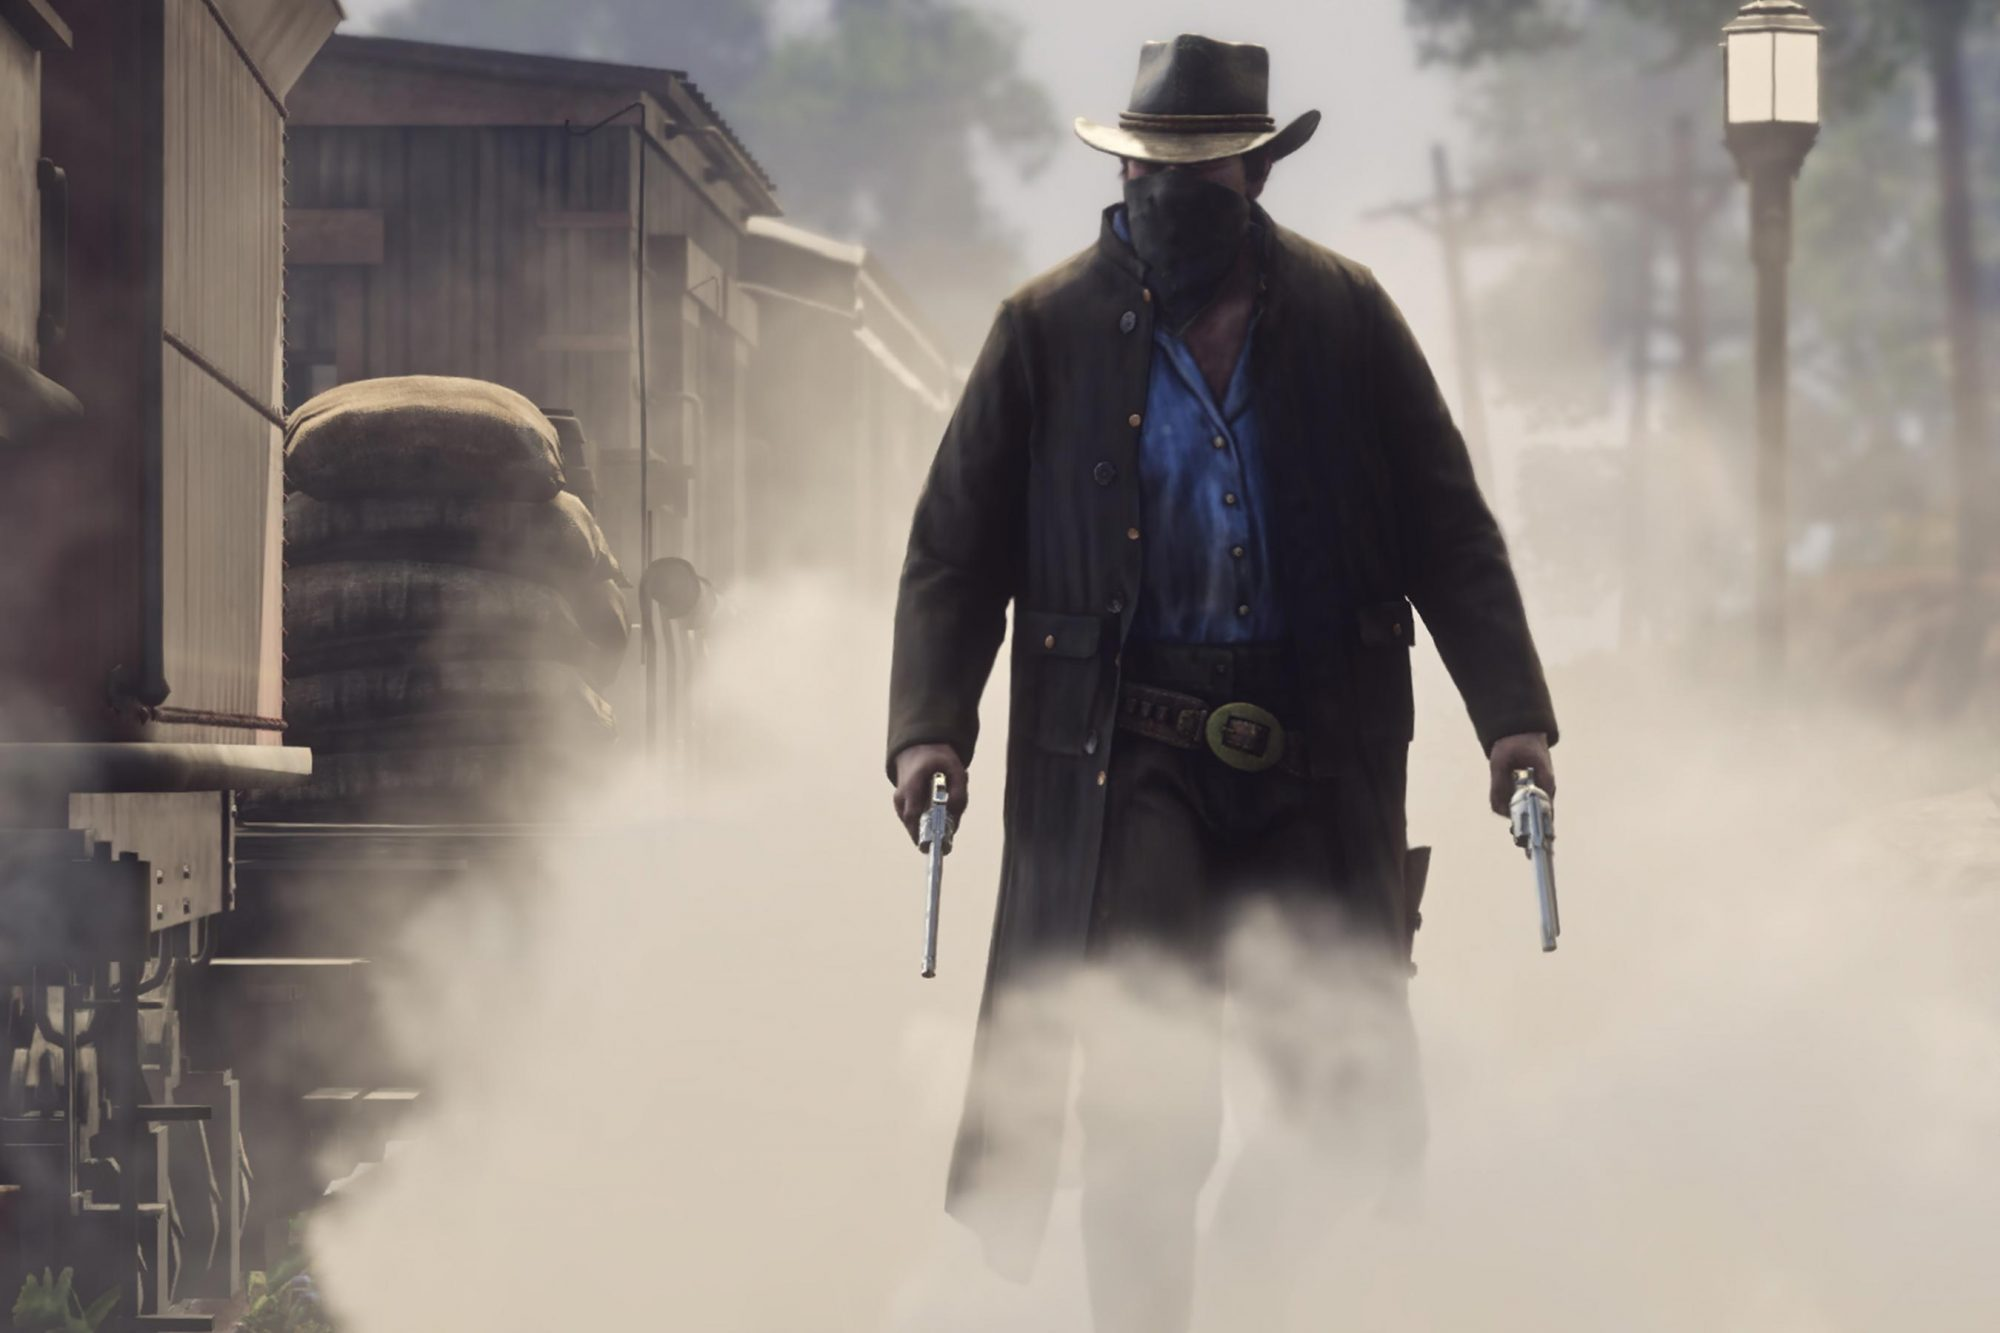 Red Dead Redemption 2 video game (2018) 2 CR: Rockstar Games